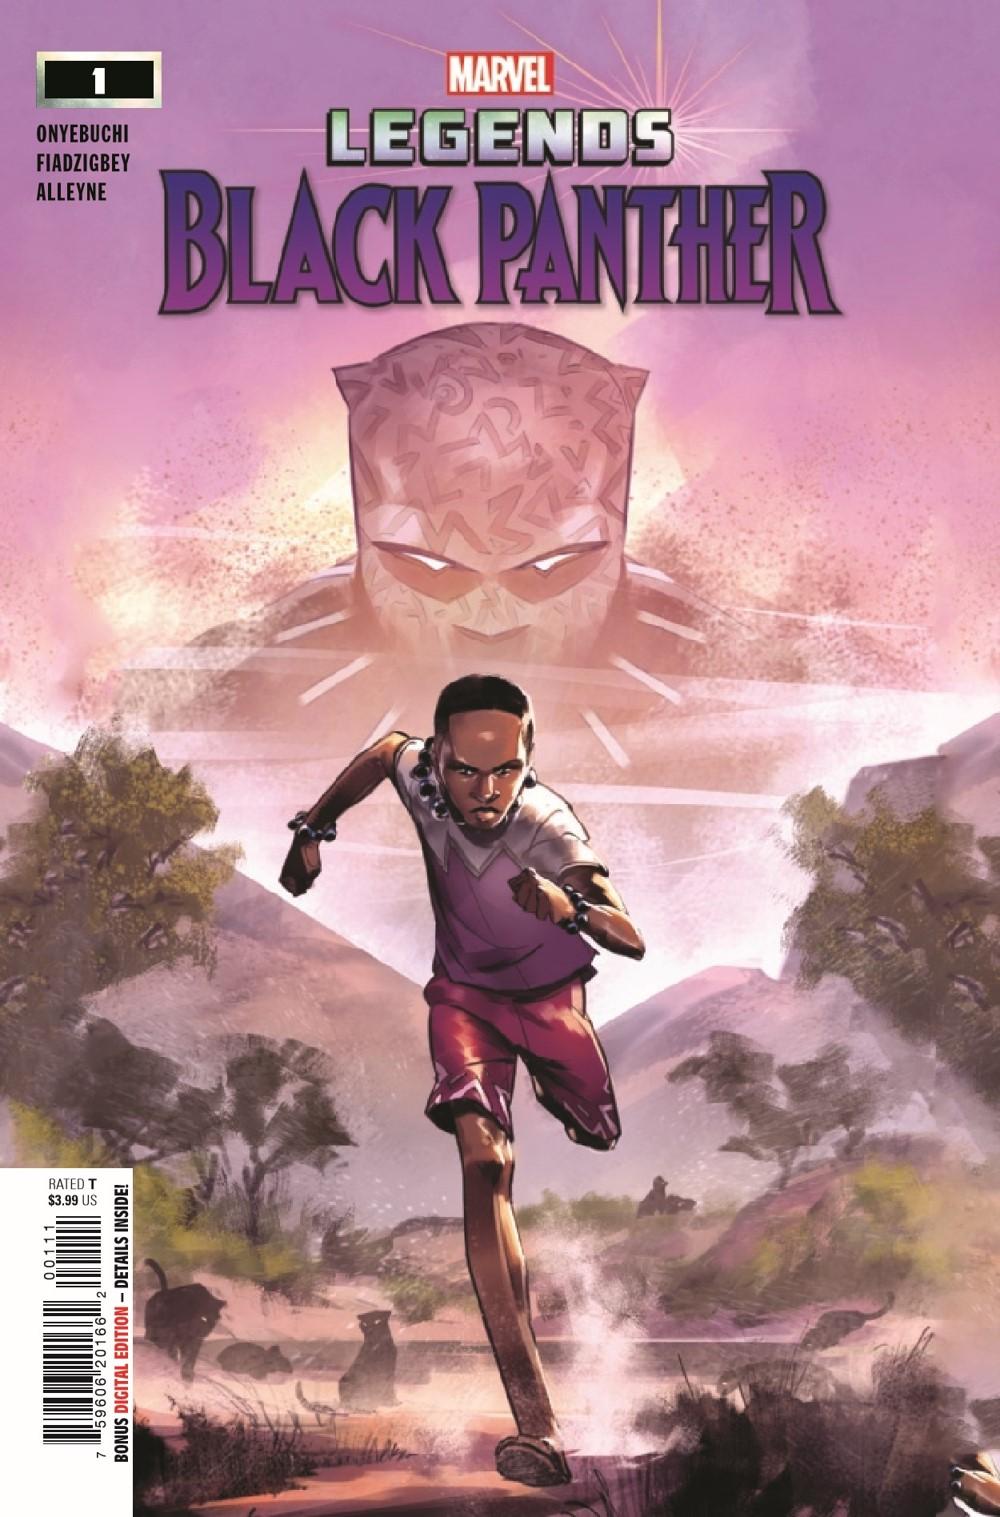 BLAPLEG2021001_Preview-1 ComicList Previews: BLACK PANTHER LEGENDS #1 (OF 4)